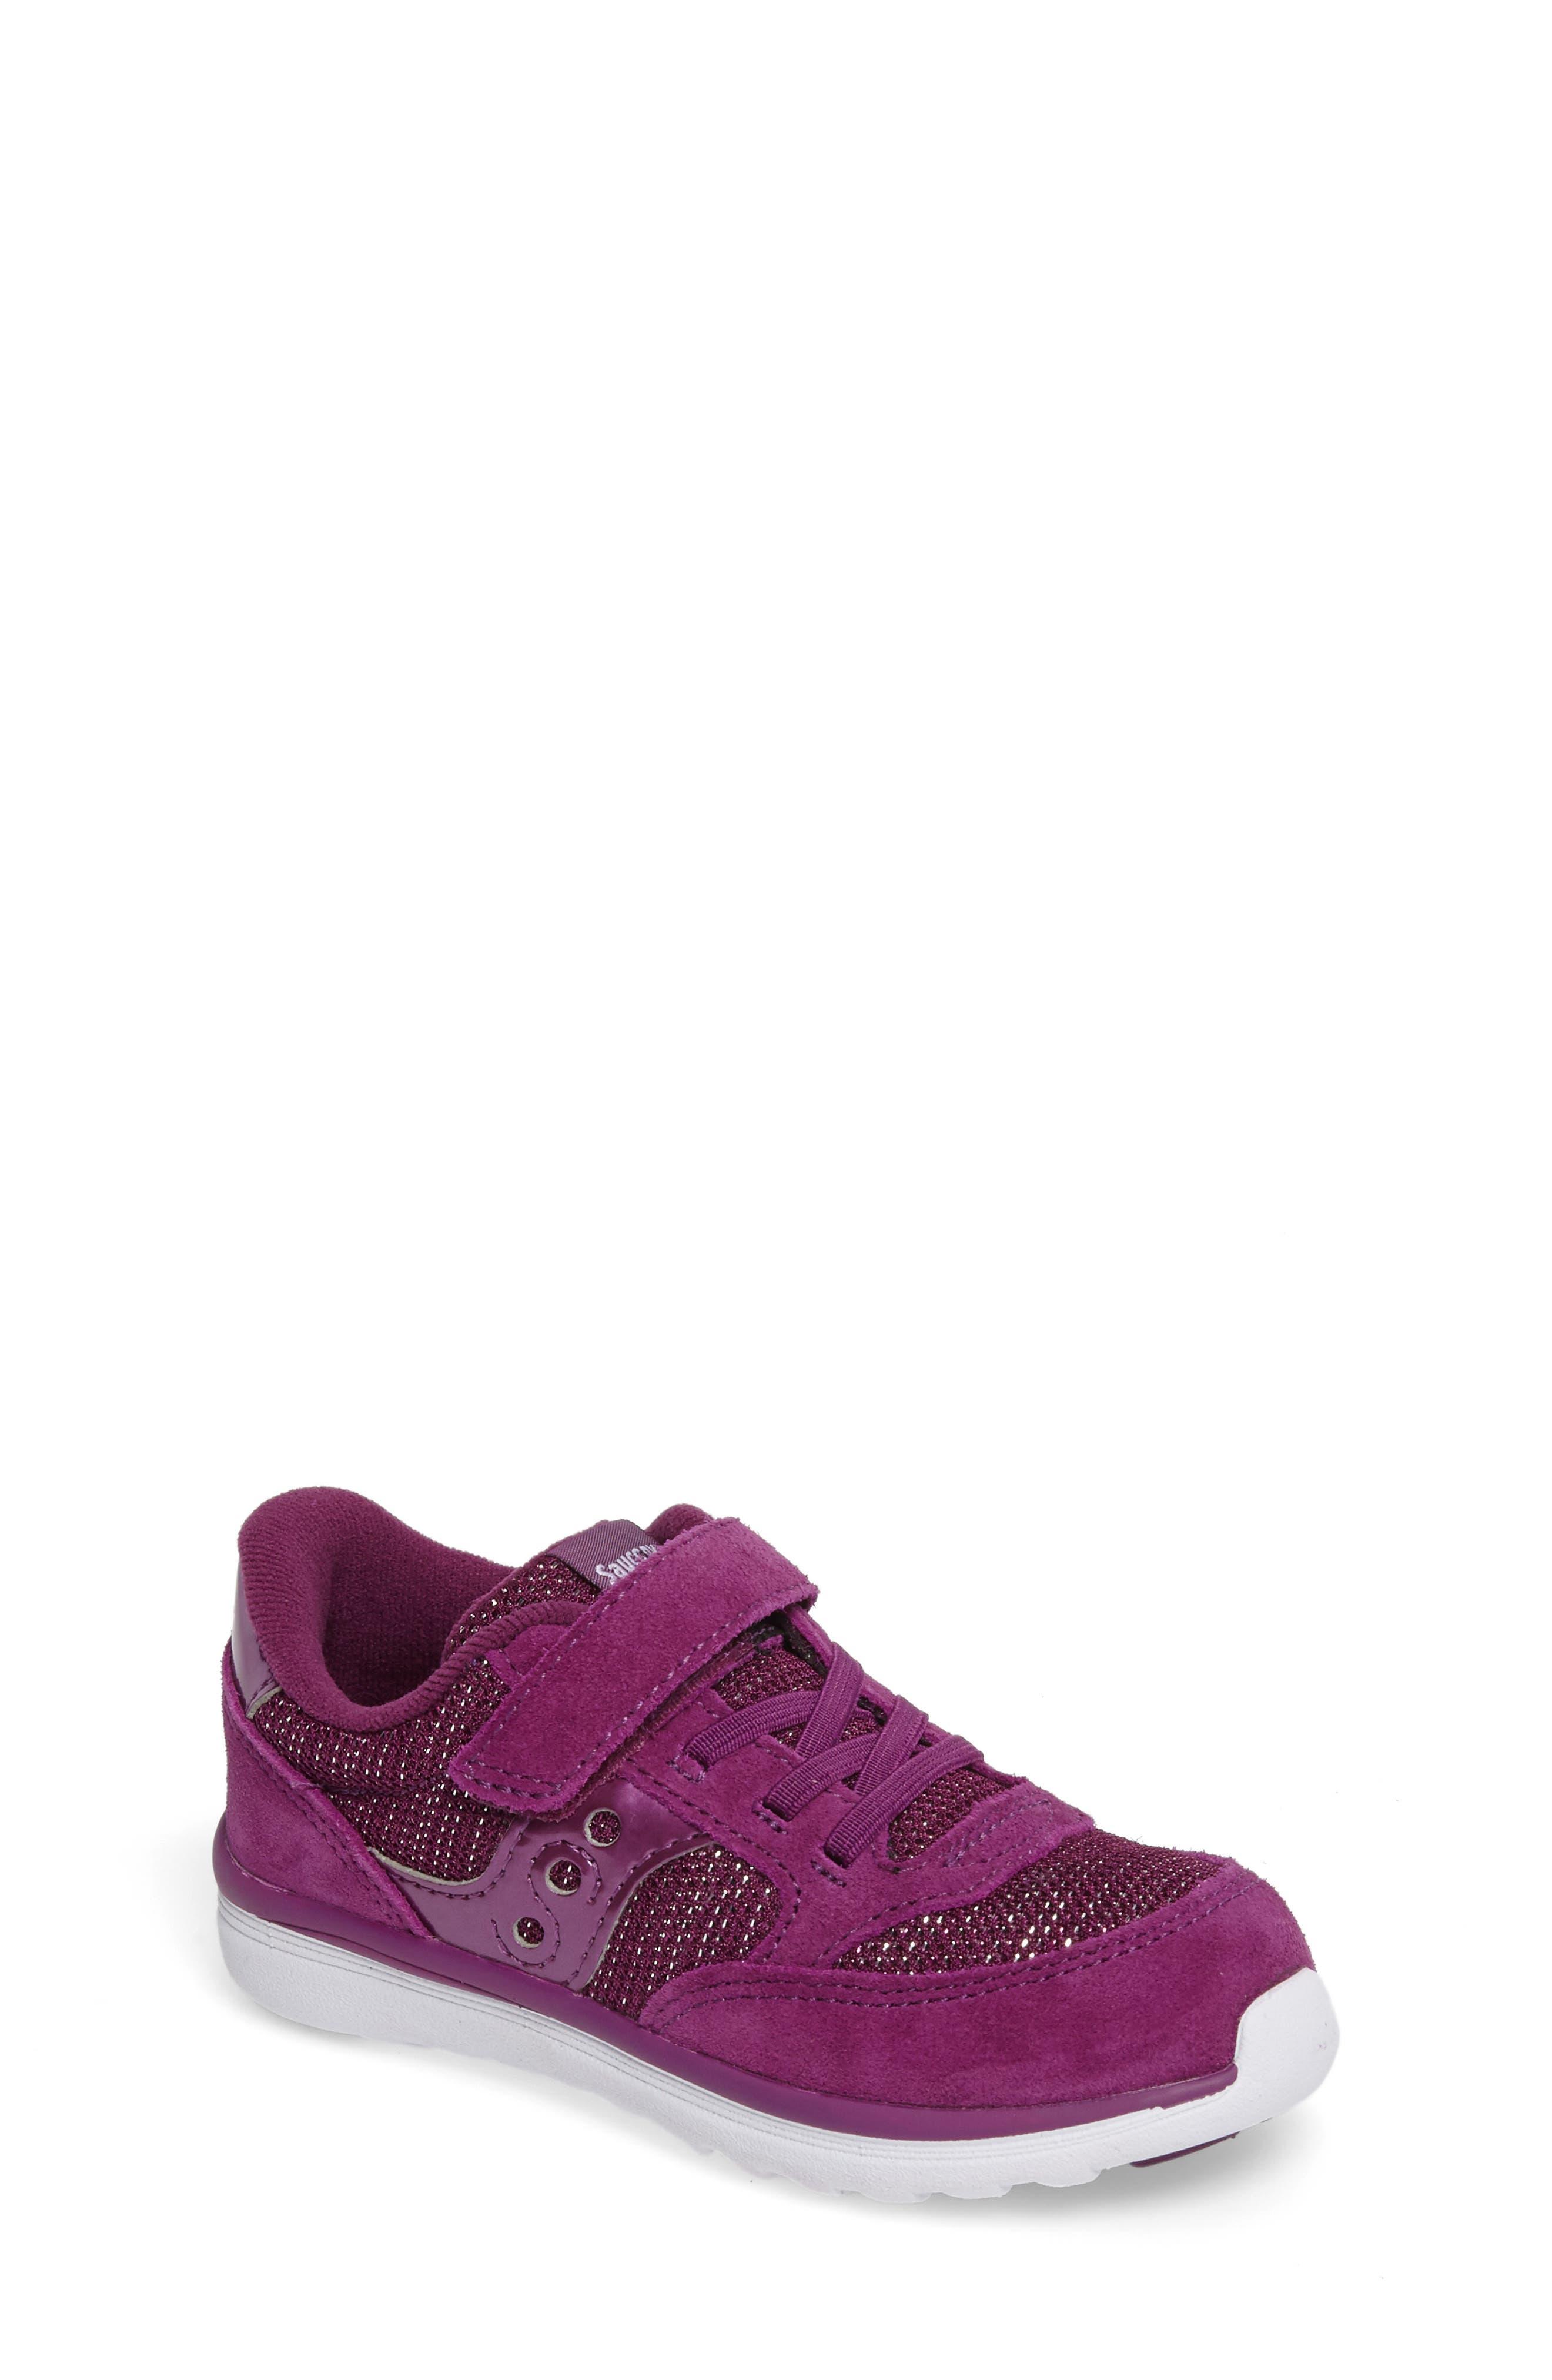 Alternate Image 1 Selected - Saucony Jazz Lite Sneaker (Baby, Toddler & Walker)